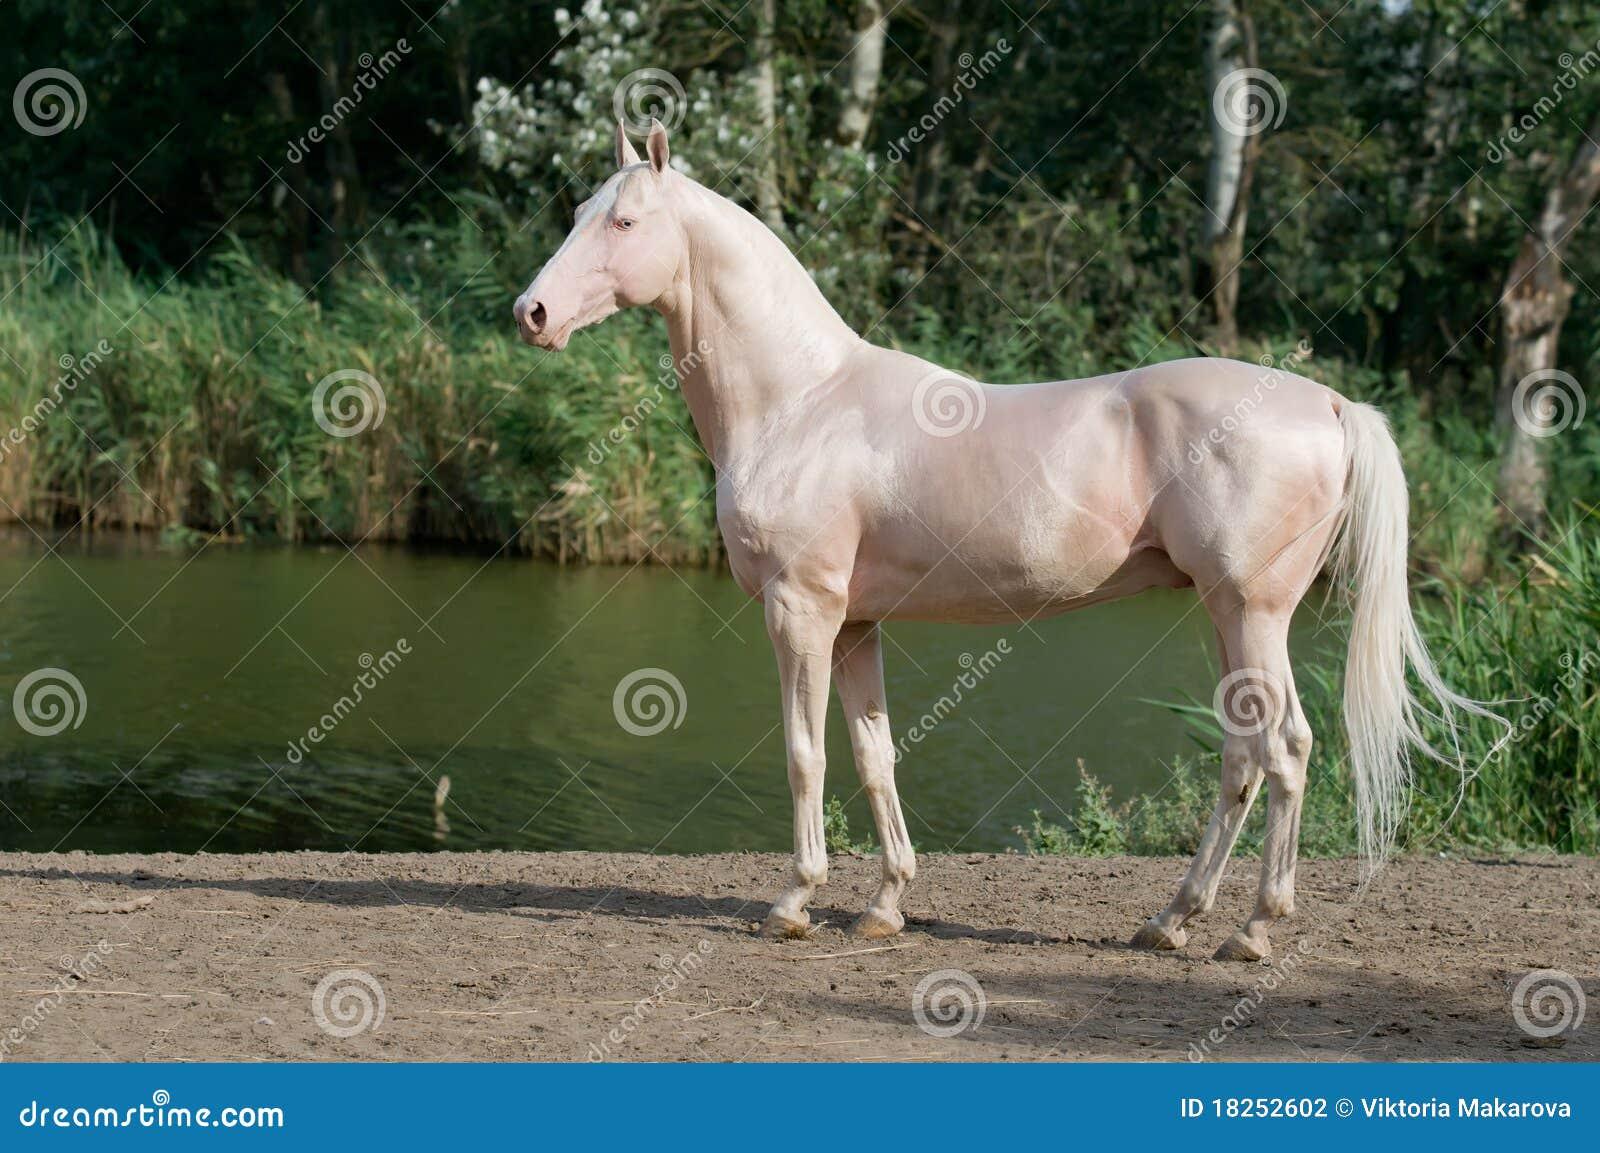 Cremello akhal-teke horse stallion portrait